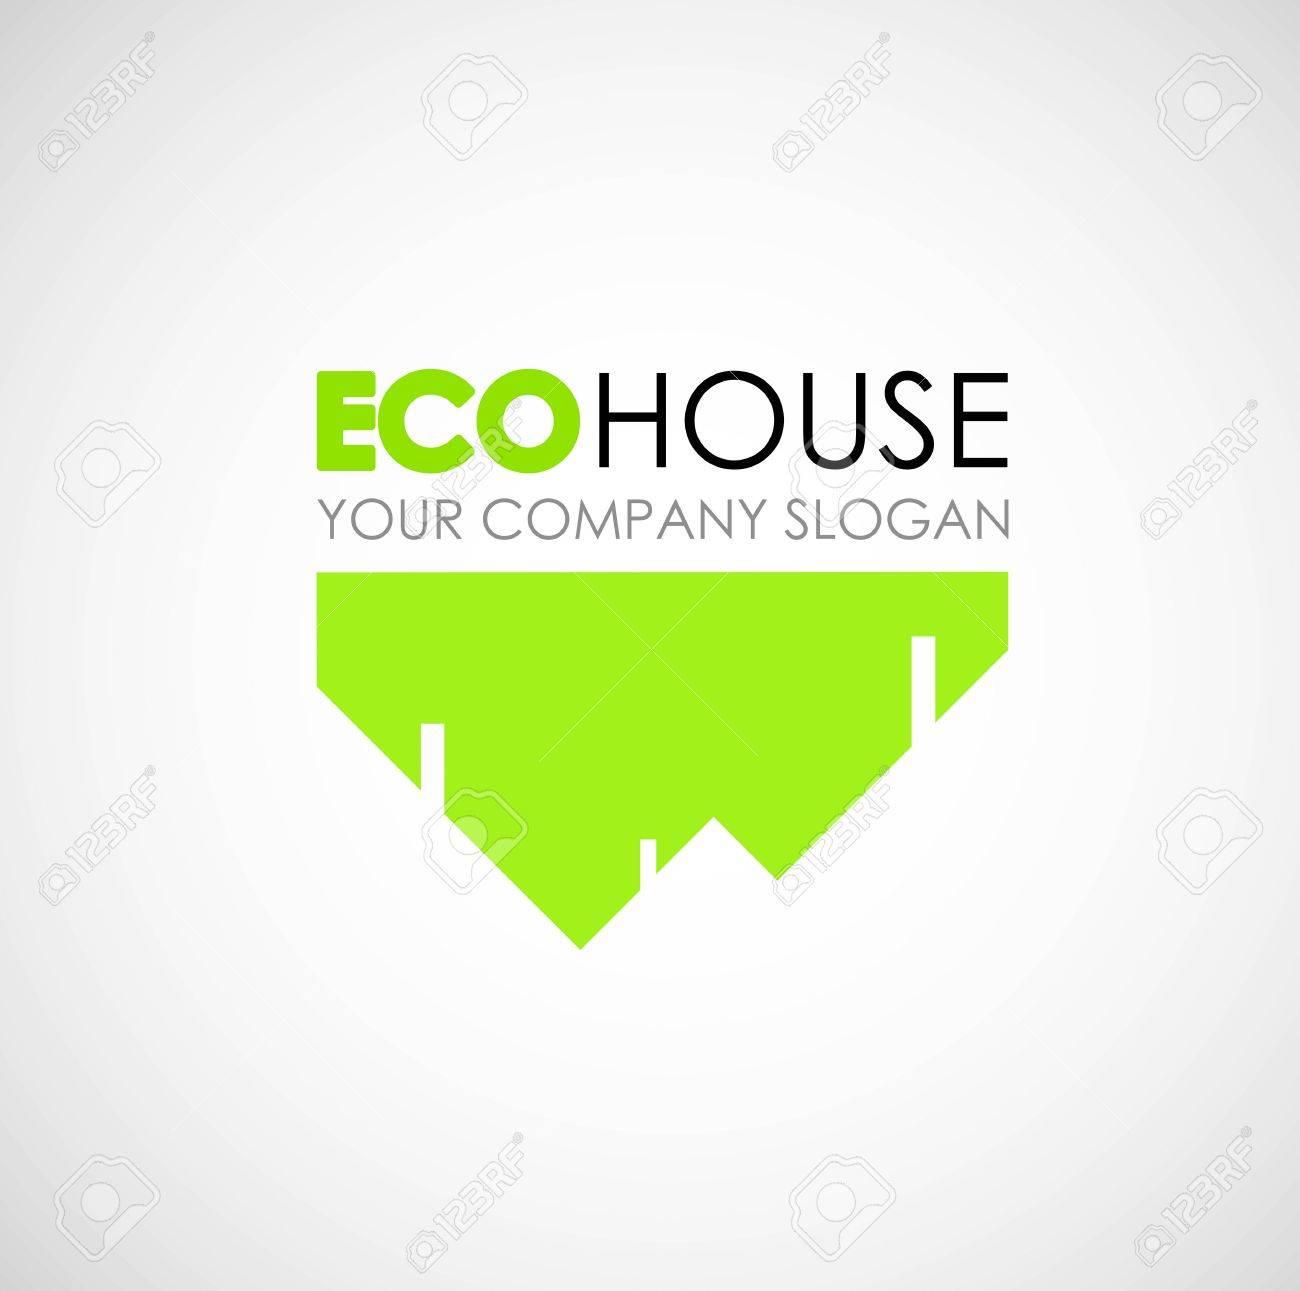 Eco House Logo Design Ecological Construction Idea Eco Architecture